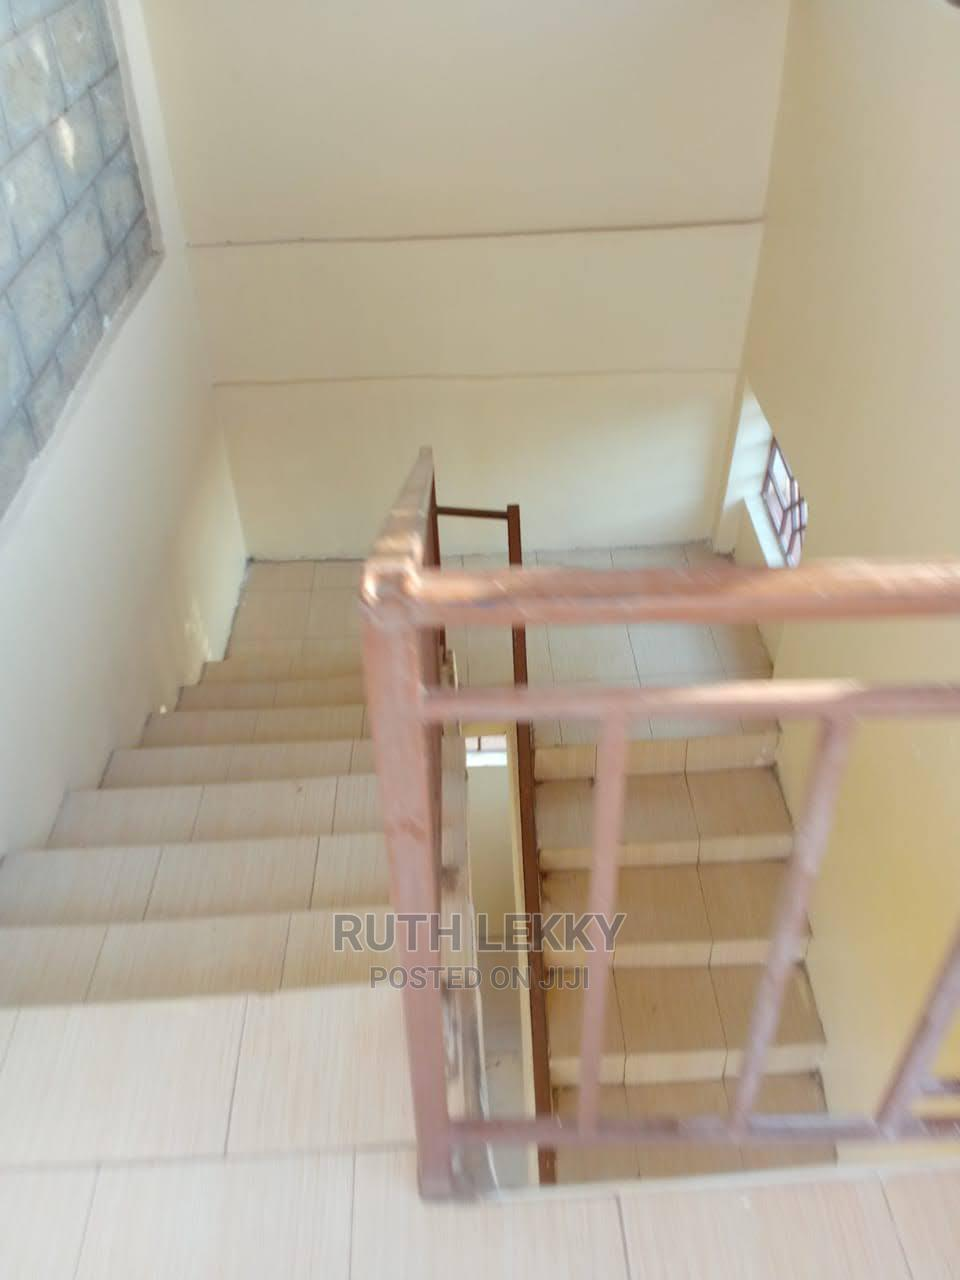 8bdrm Block of Flats in Carwash, Kisumu Central for Sale | Houses & Apartments For Sale for sale in Kisumu Central, Kisumu, Kenya